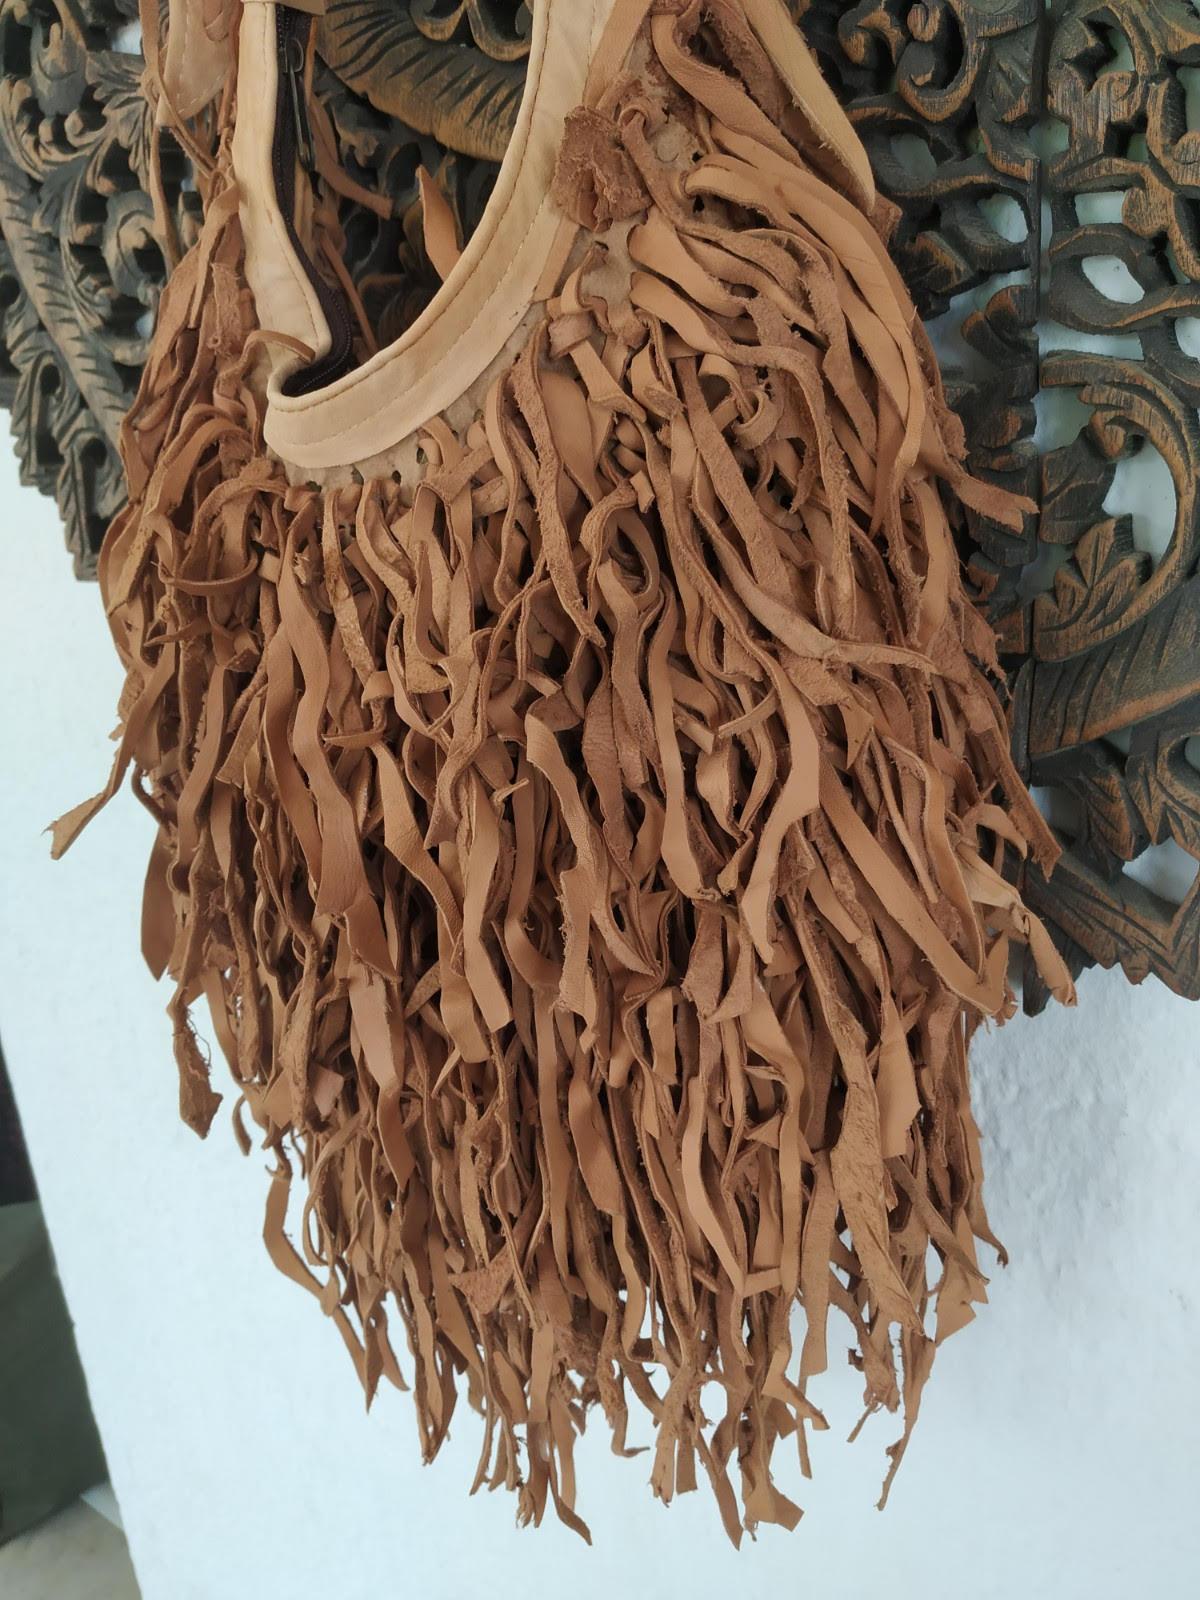 miuma-bolso-flecos-piel-marron-moda-cambrils(4)